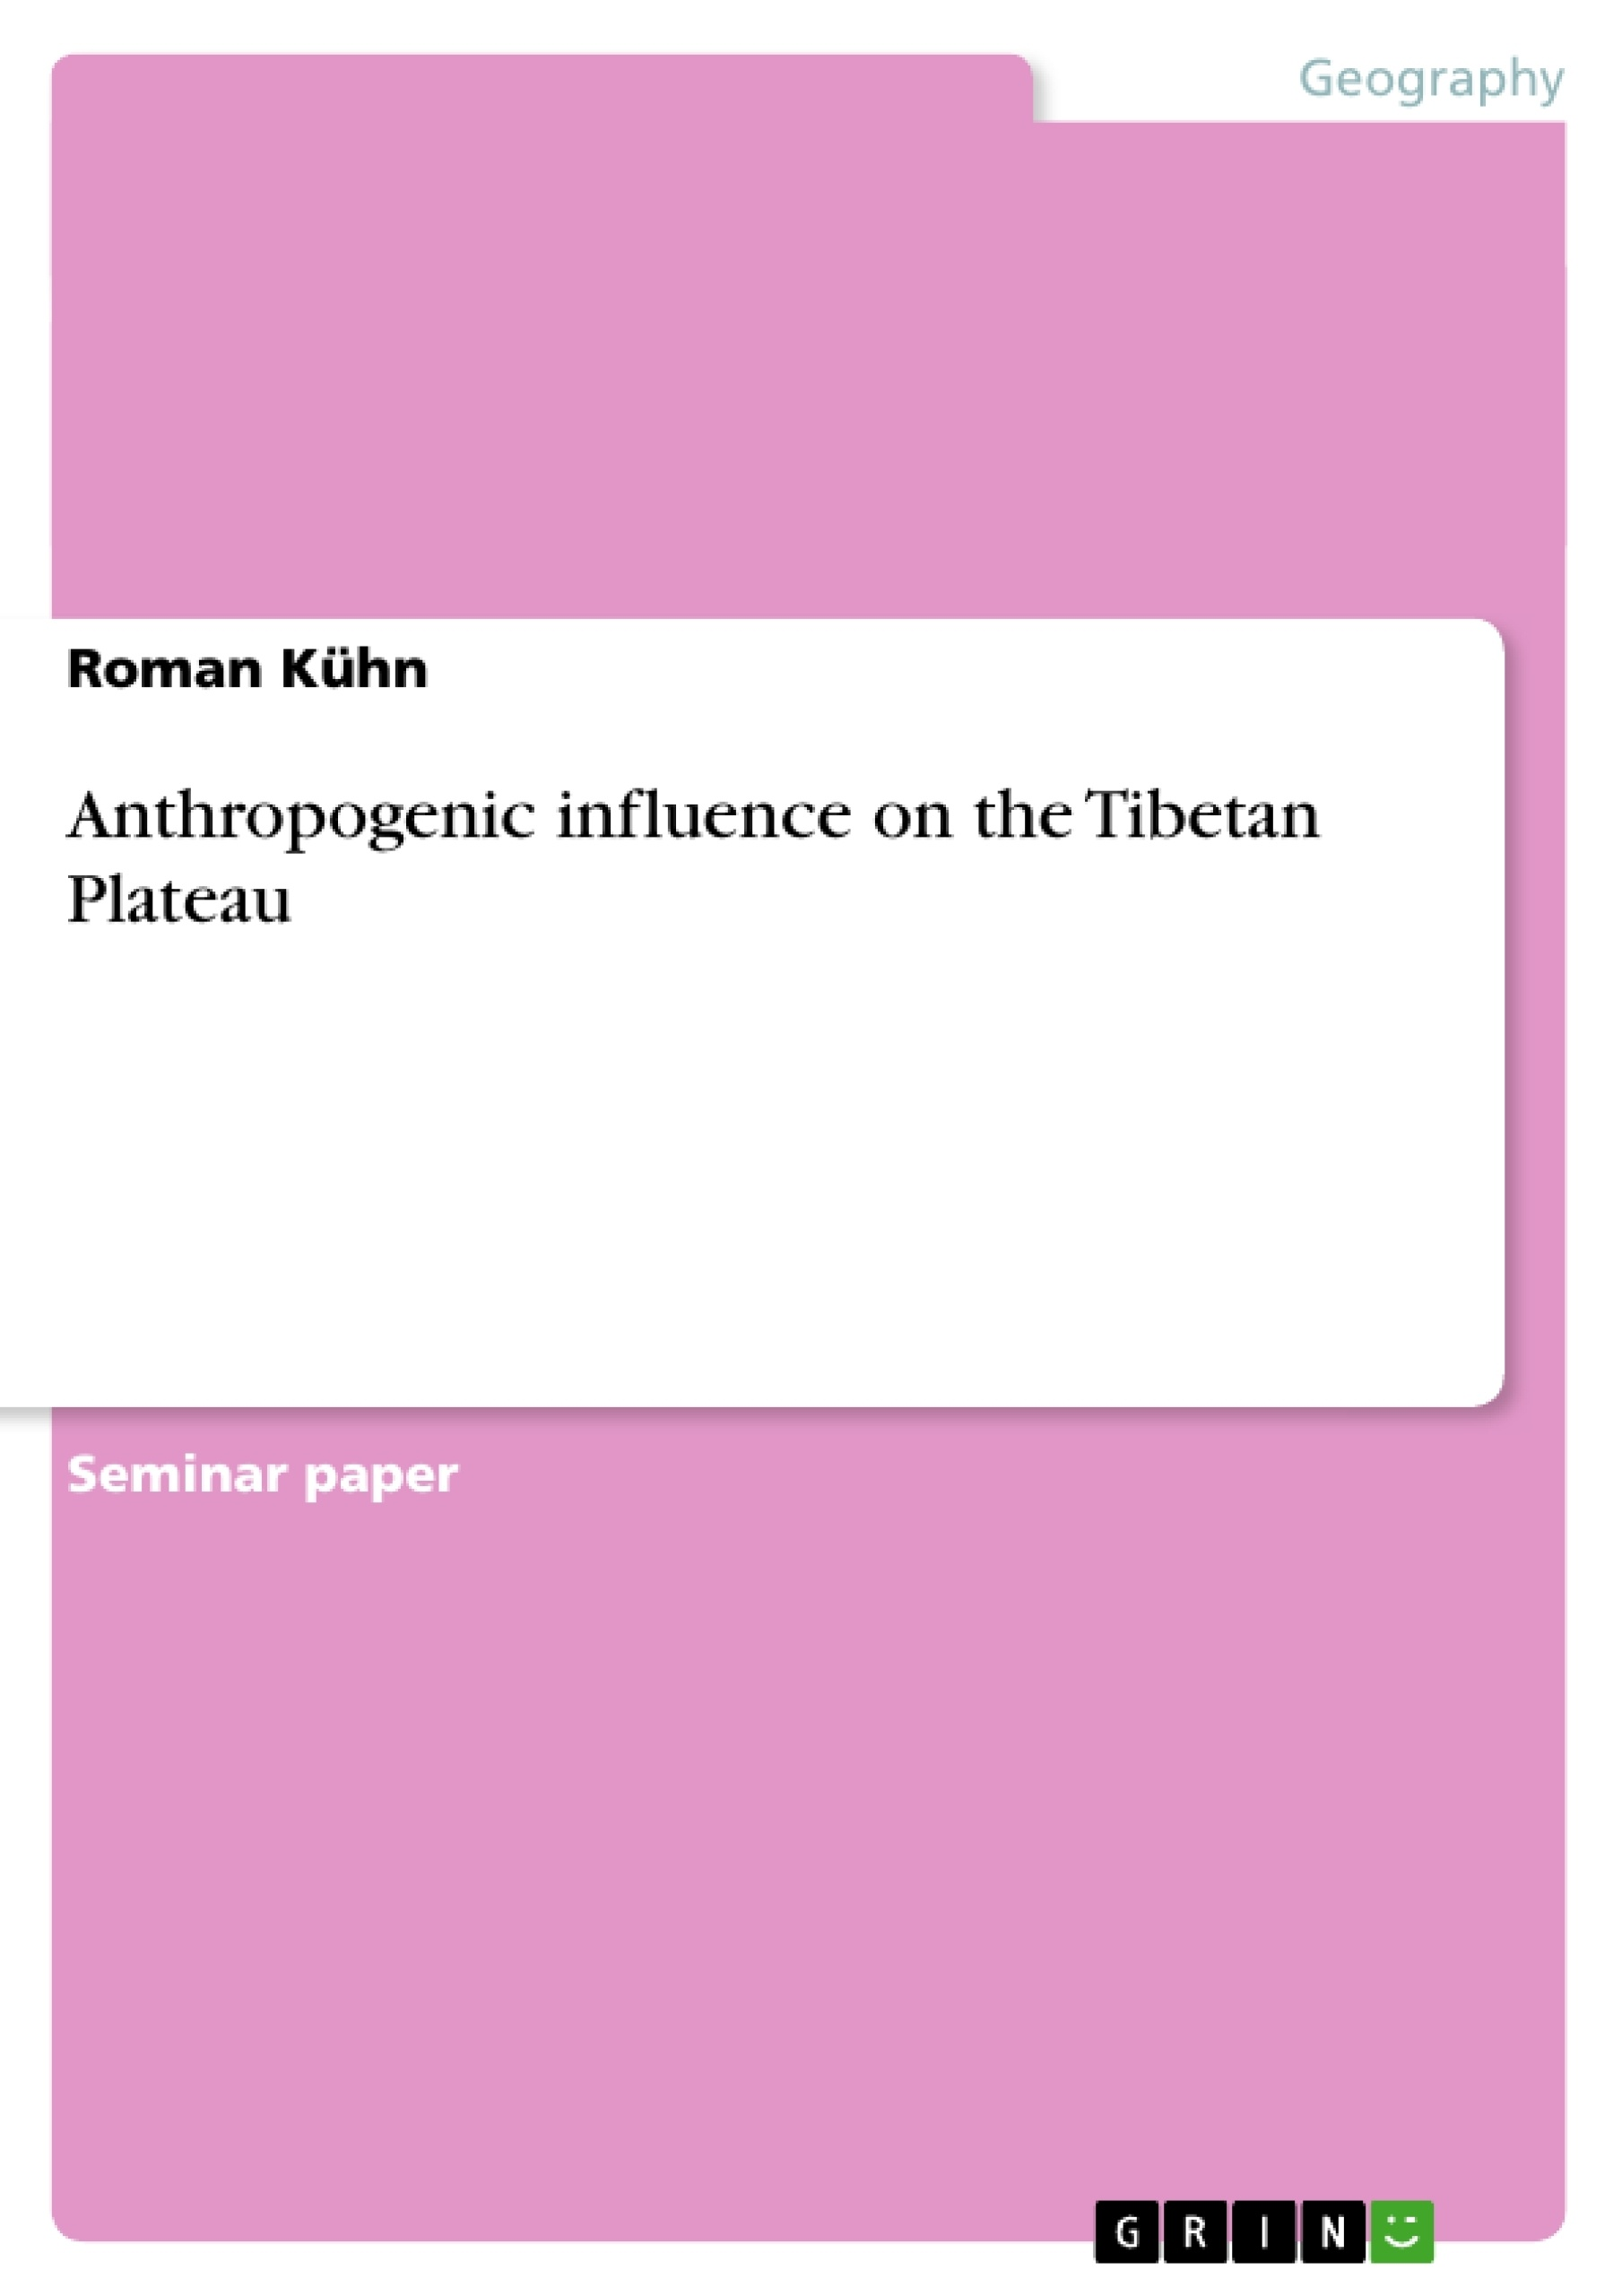 Title: Anthropogenic influence on the Tibetan Plateau